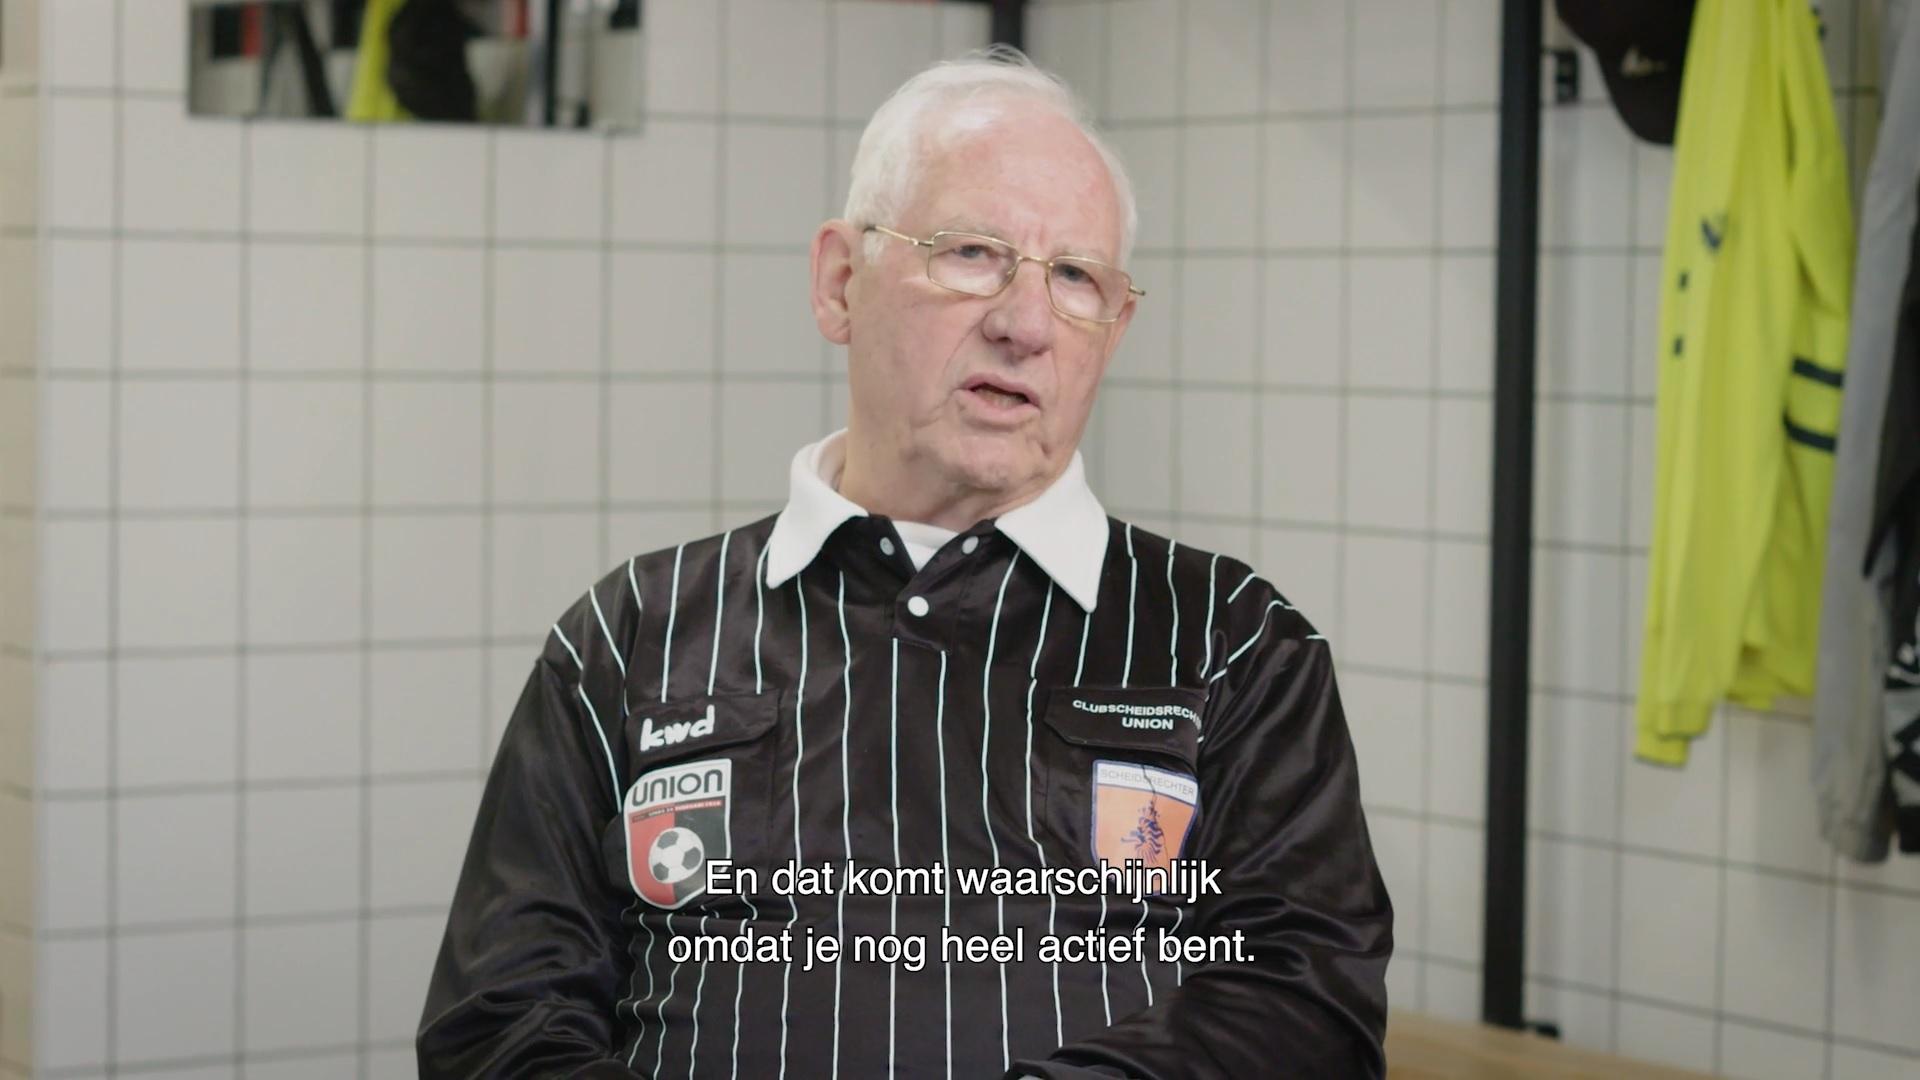 Jo Heijmink pakt hoofdrol in mini-docu over ouder worden